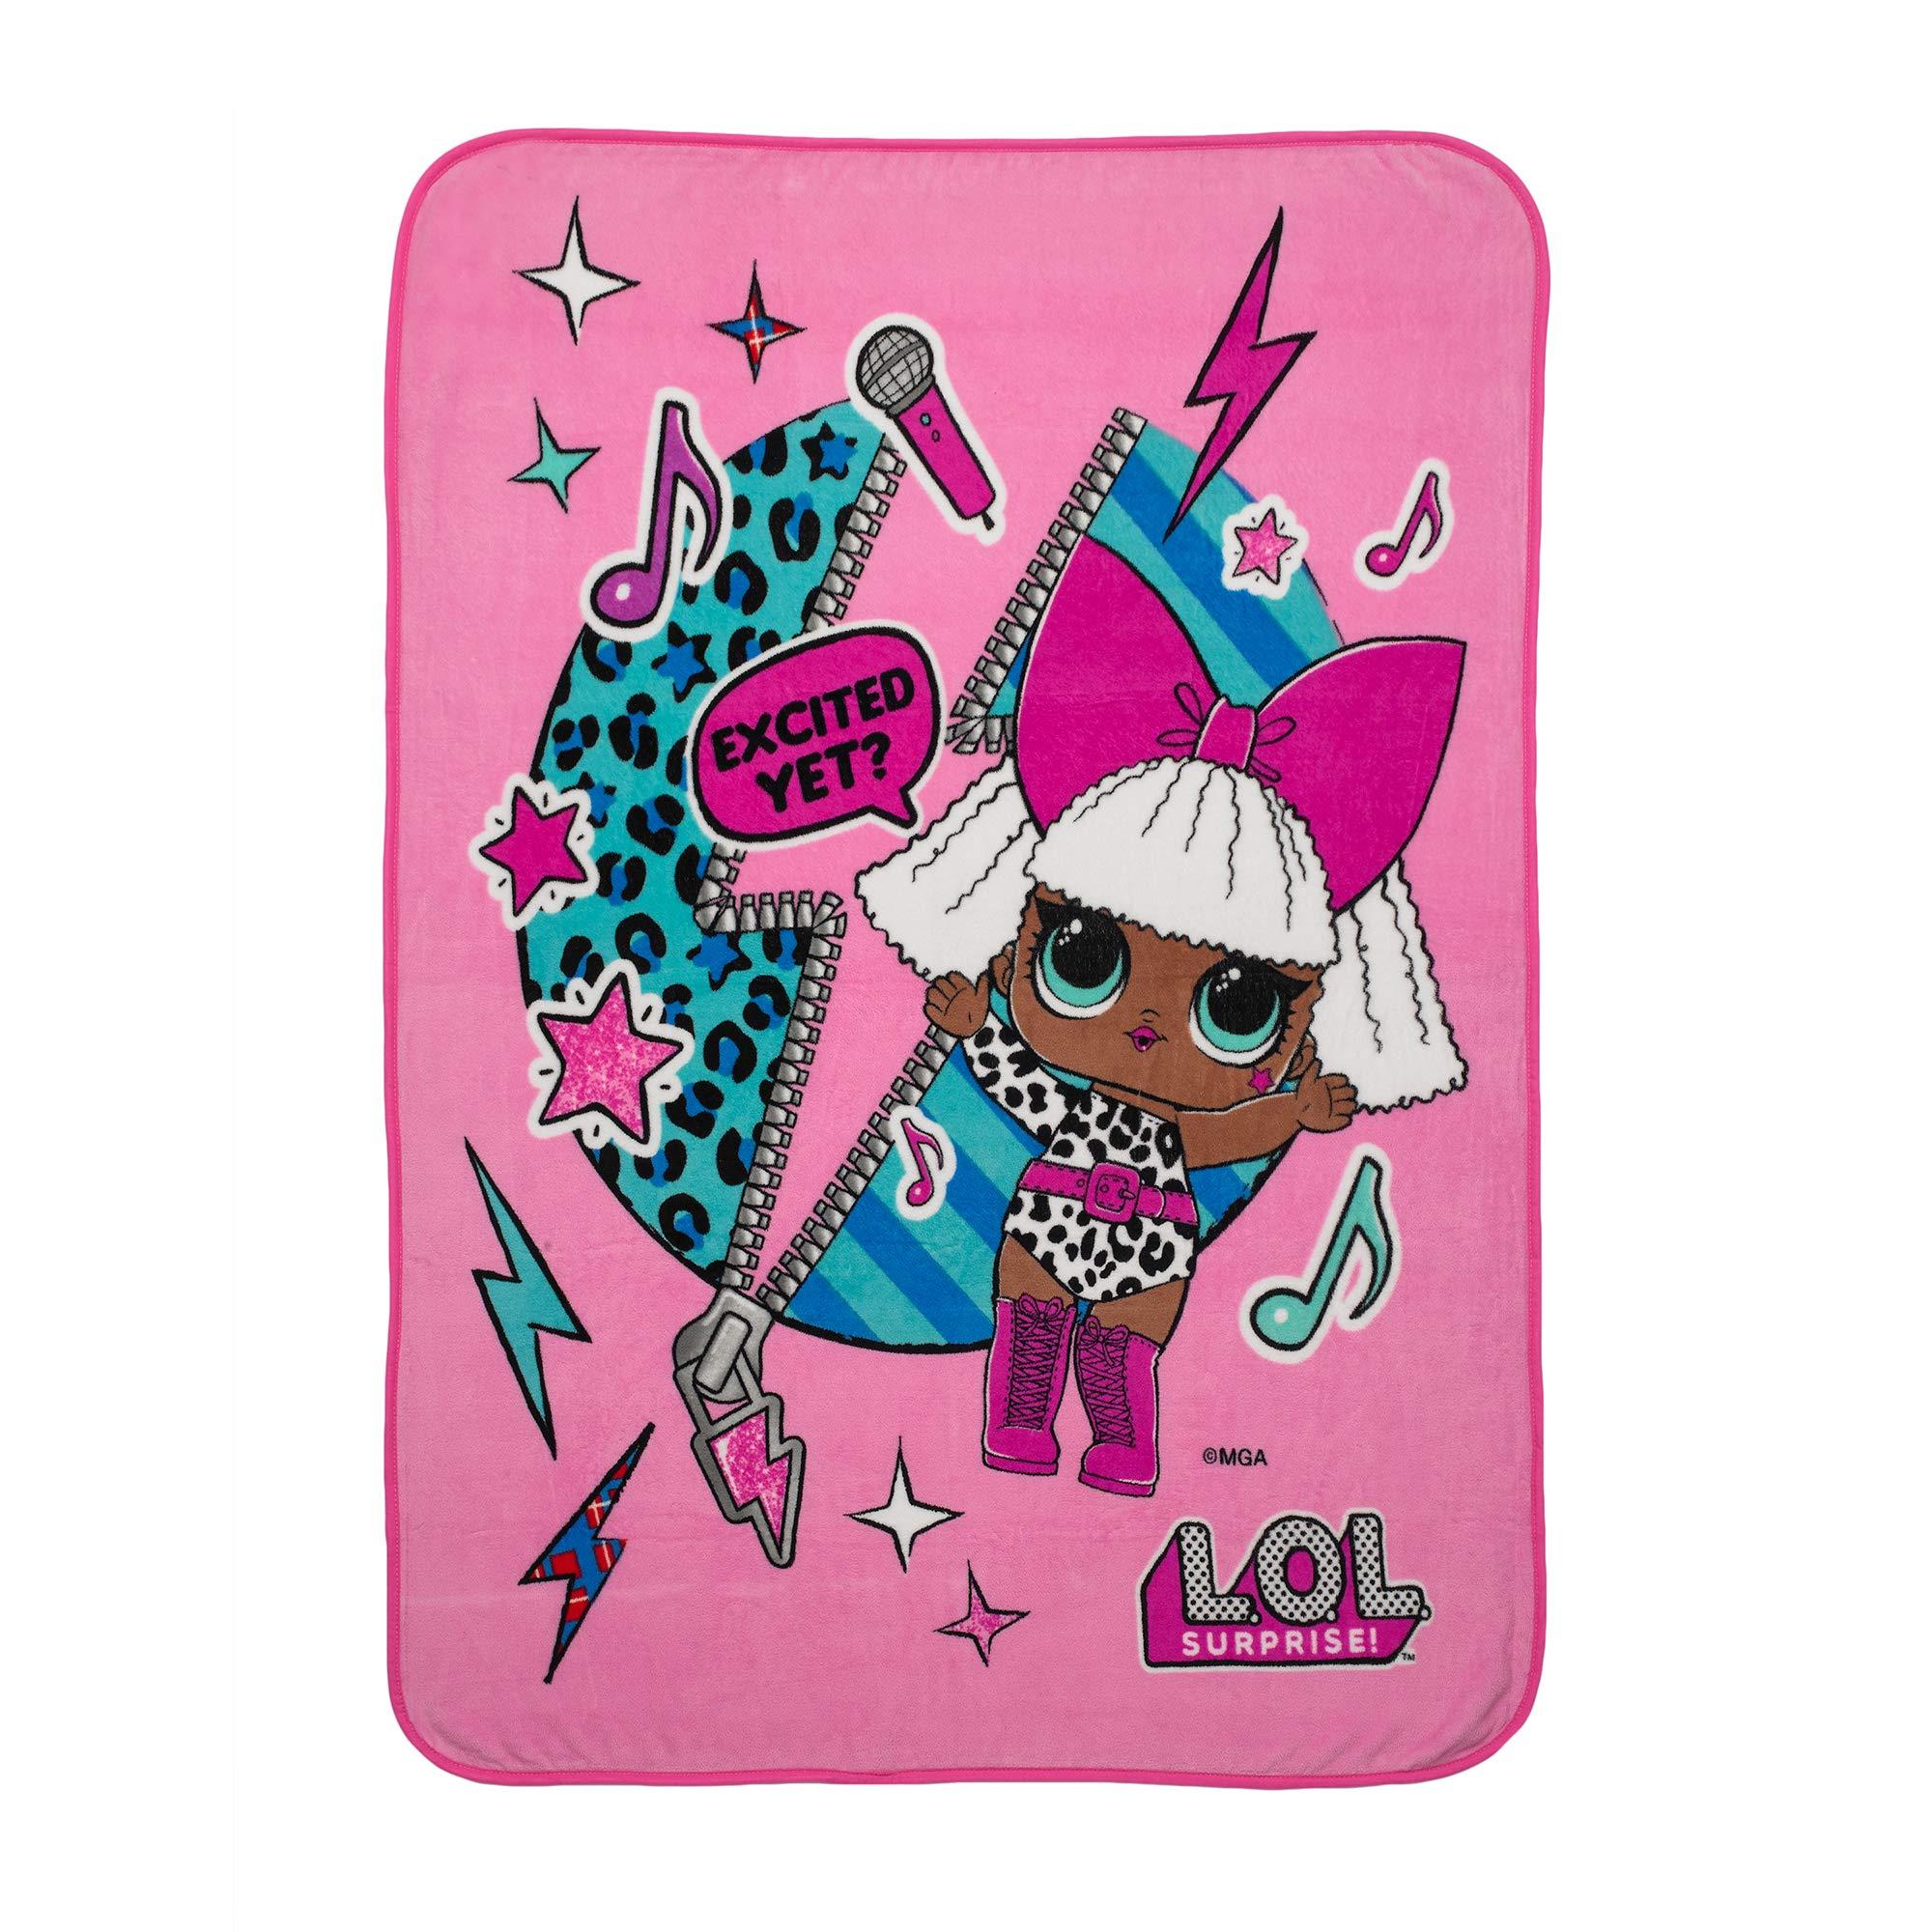 L.O.L. Surprise! Diva Character Kids Bedding Ultra Soft Plush Throw, 46'' x 60'', Pink